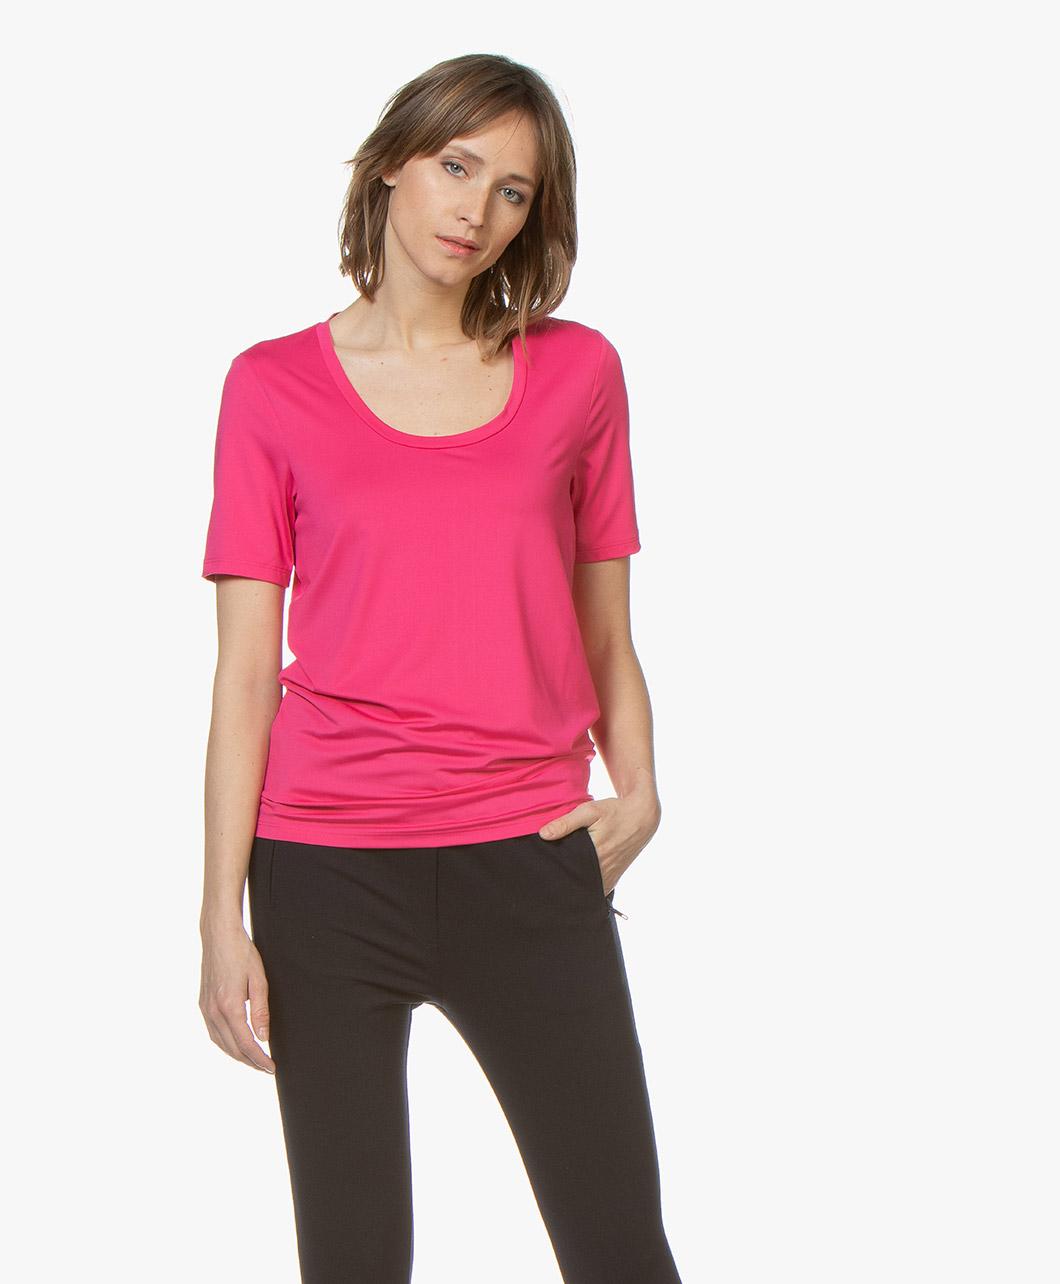 Afbeelding van Buzinezz By BRAEZ T shirt Tech Jersey in Roze